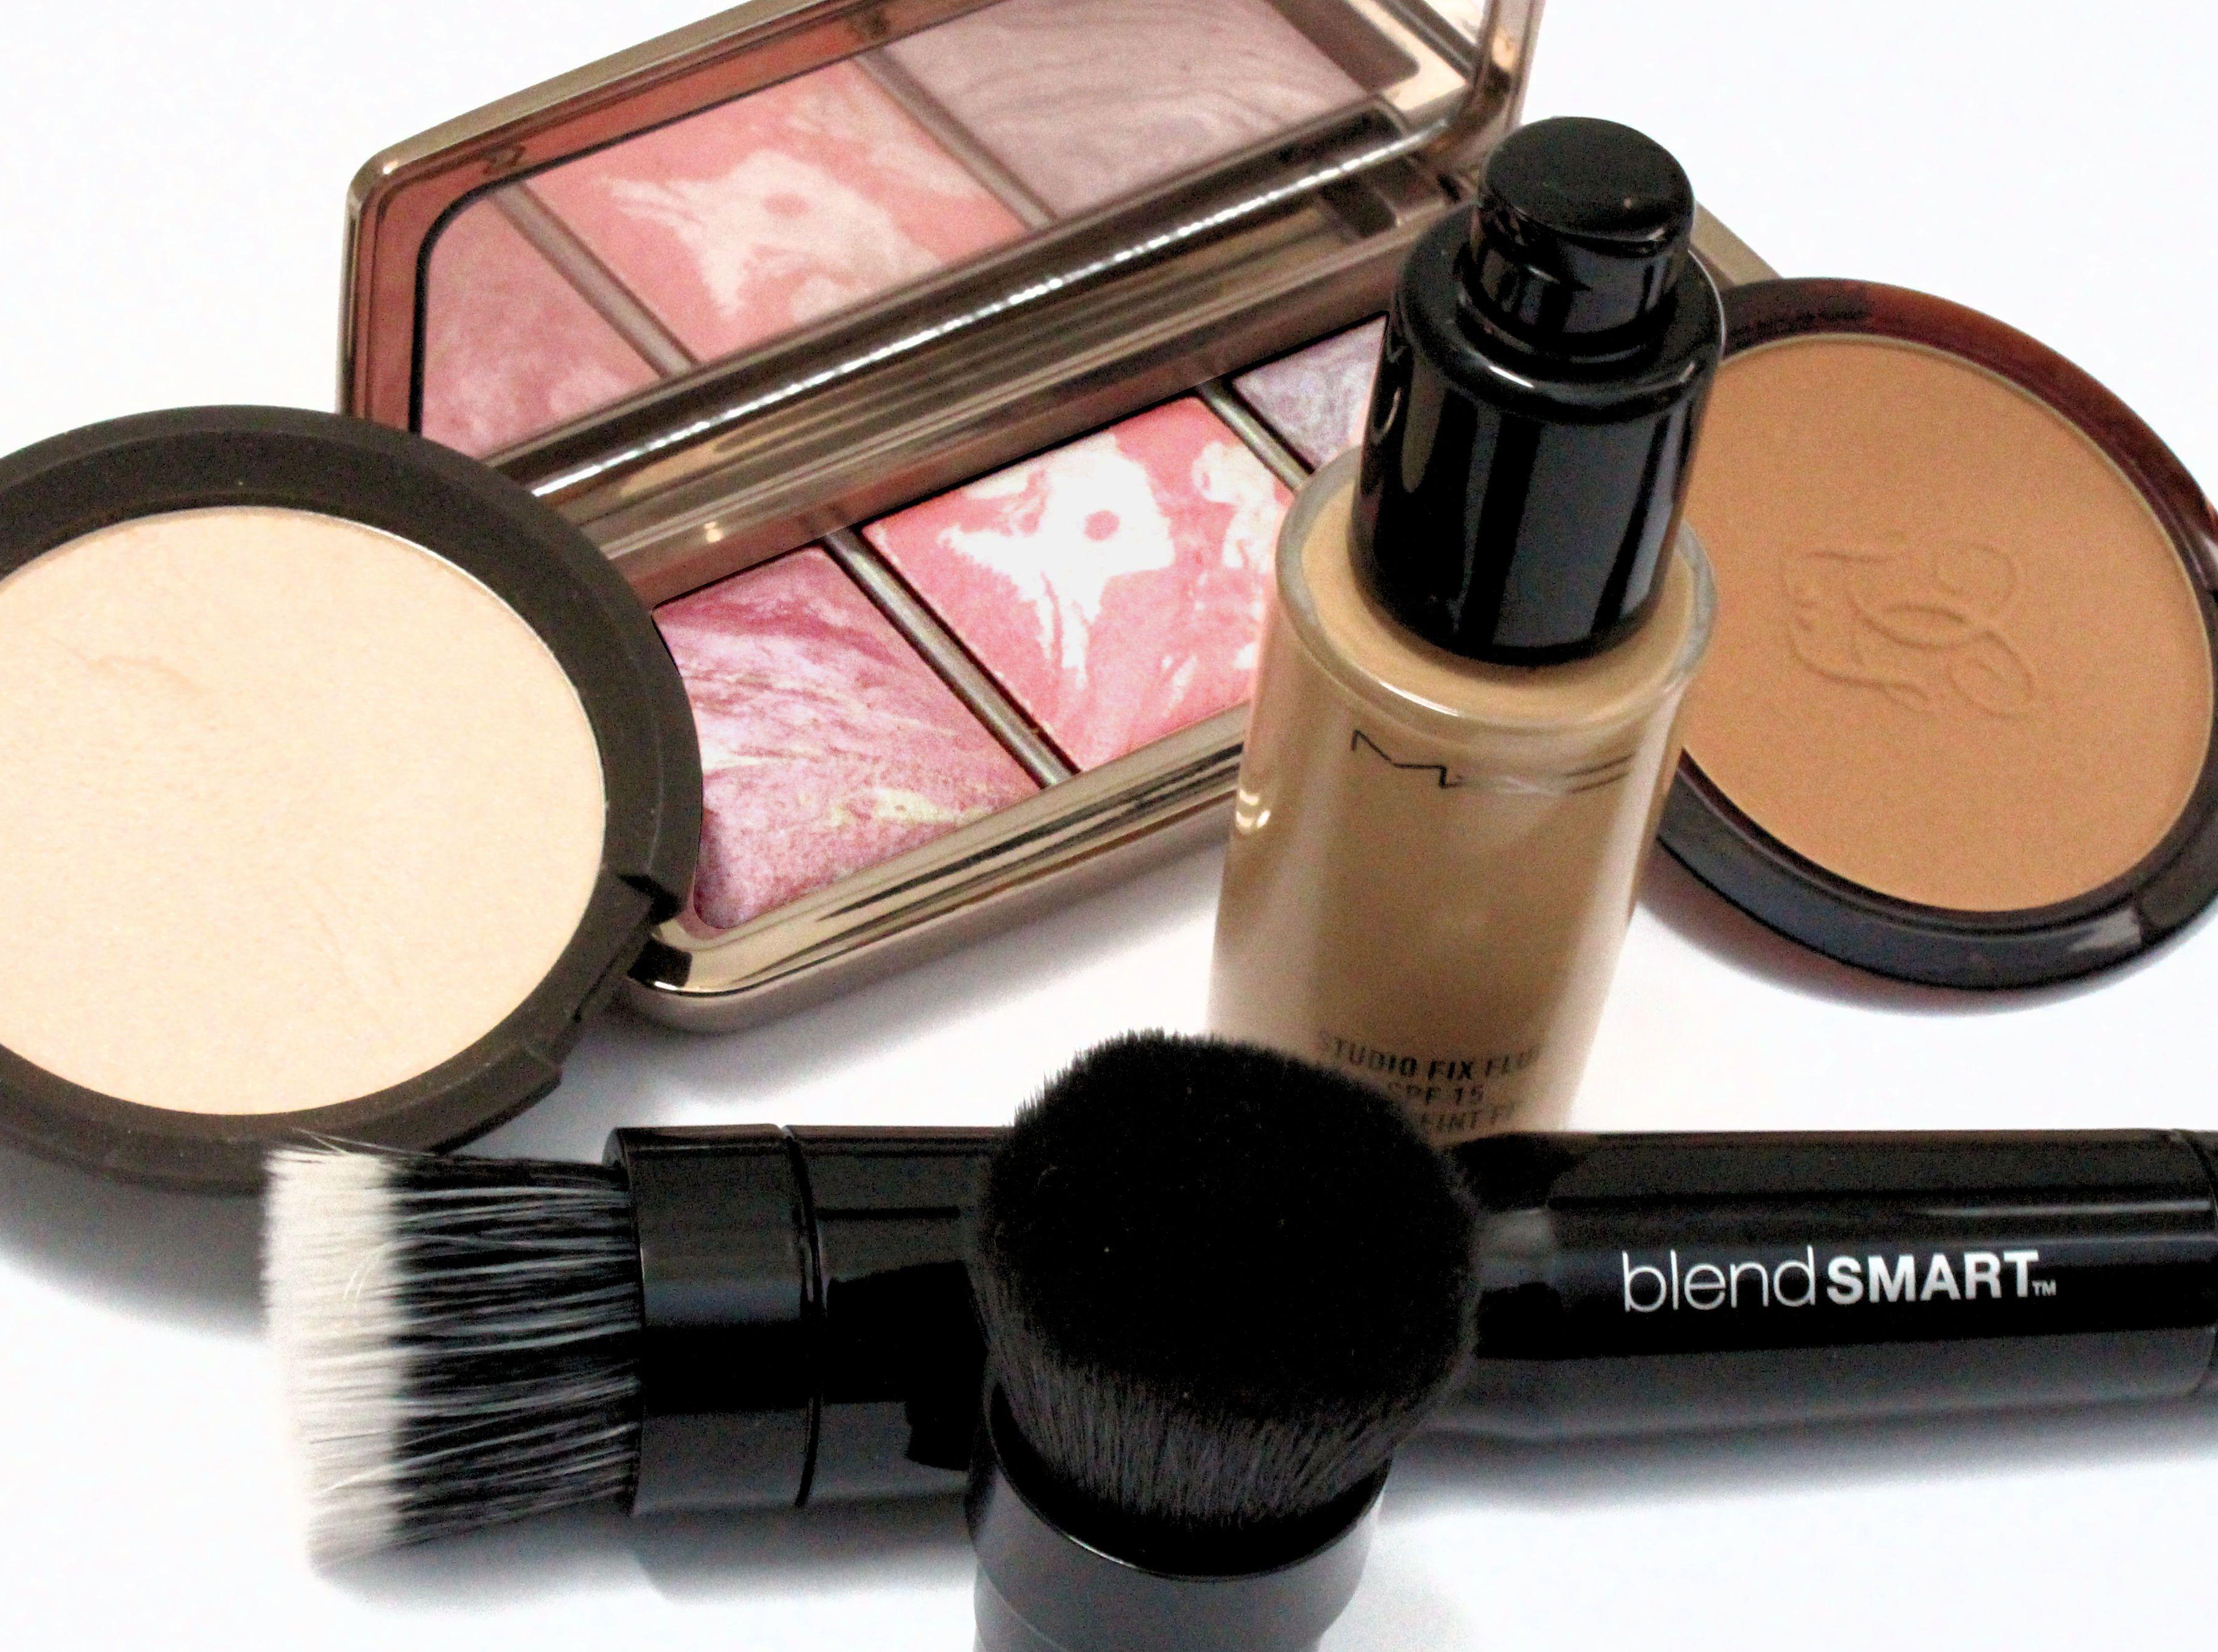 blendSmart Rotating Makeup Brush Review Makeup brush